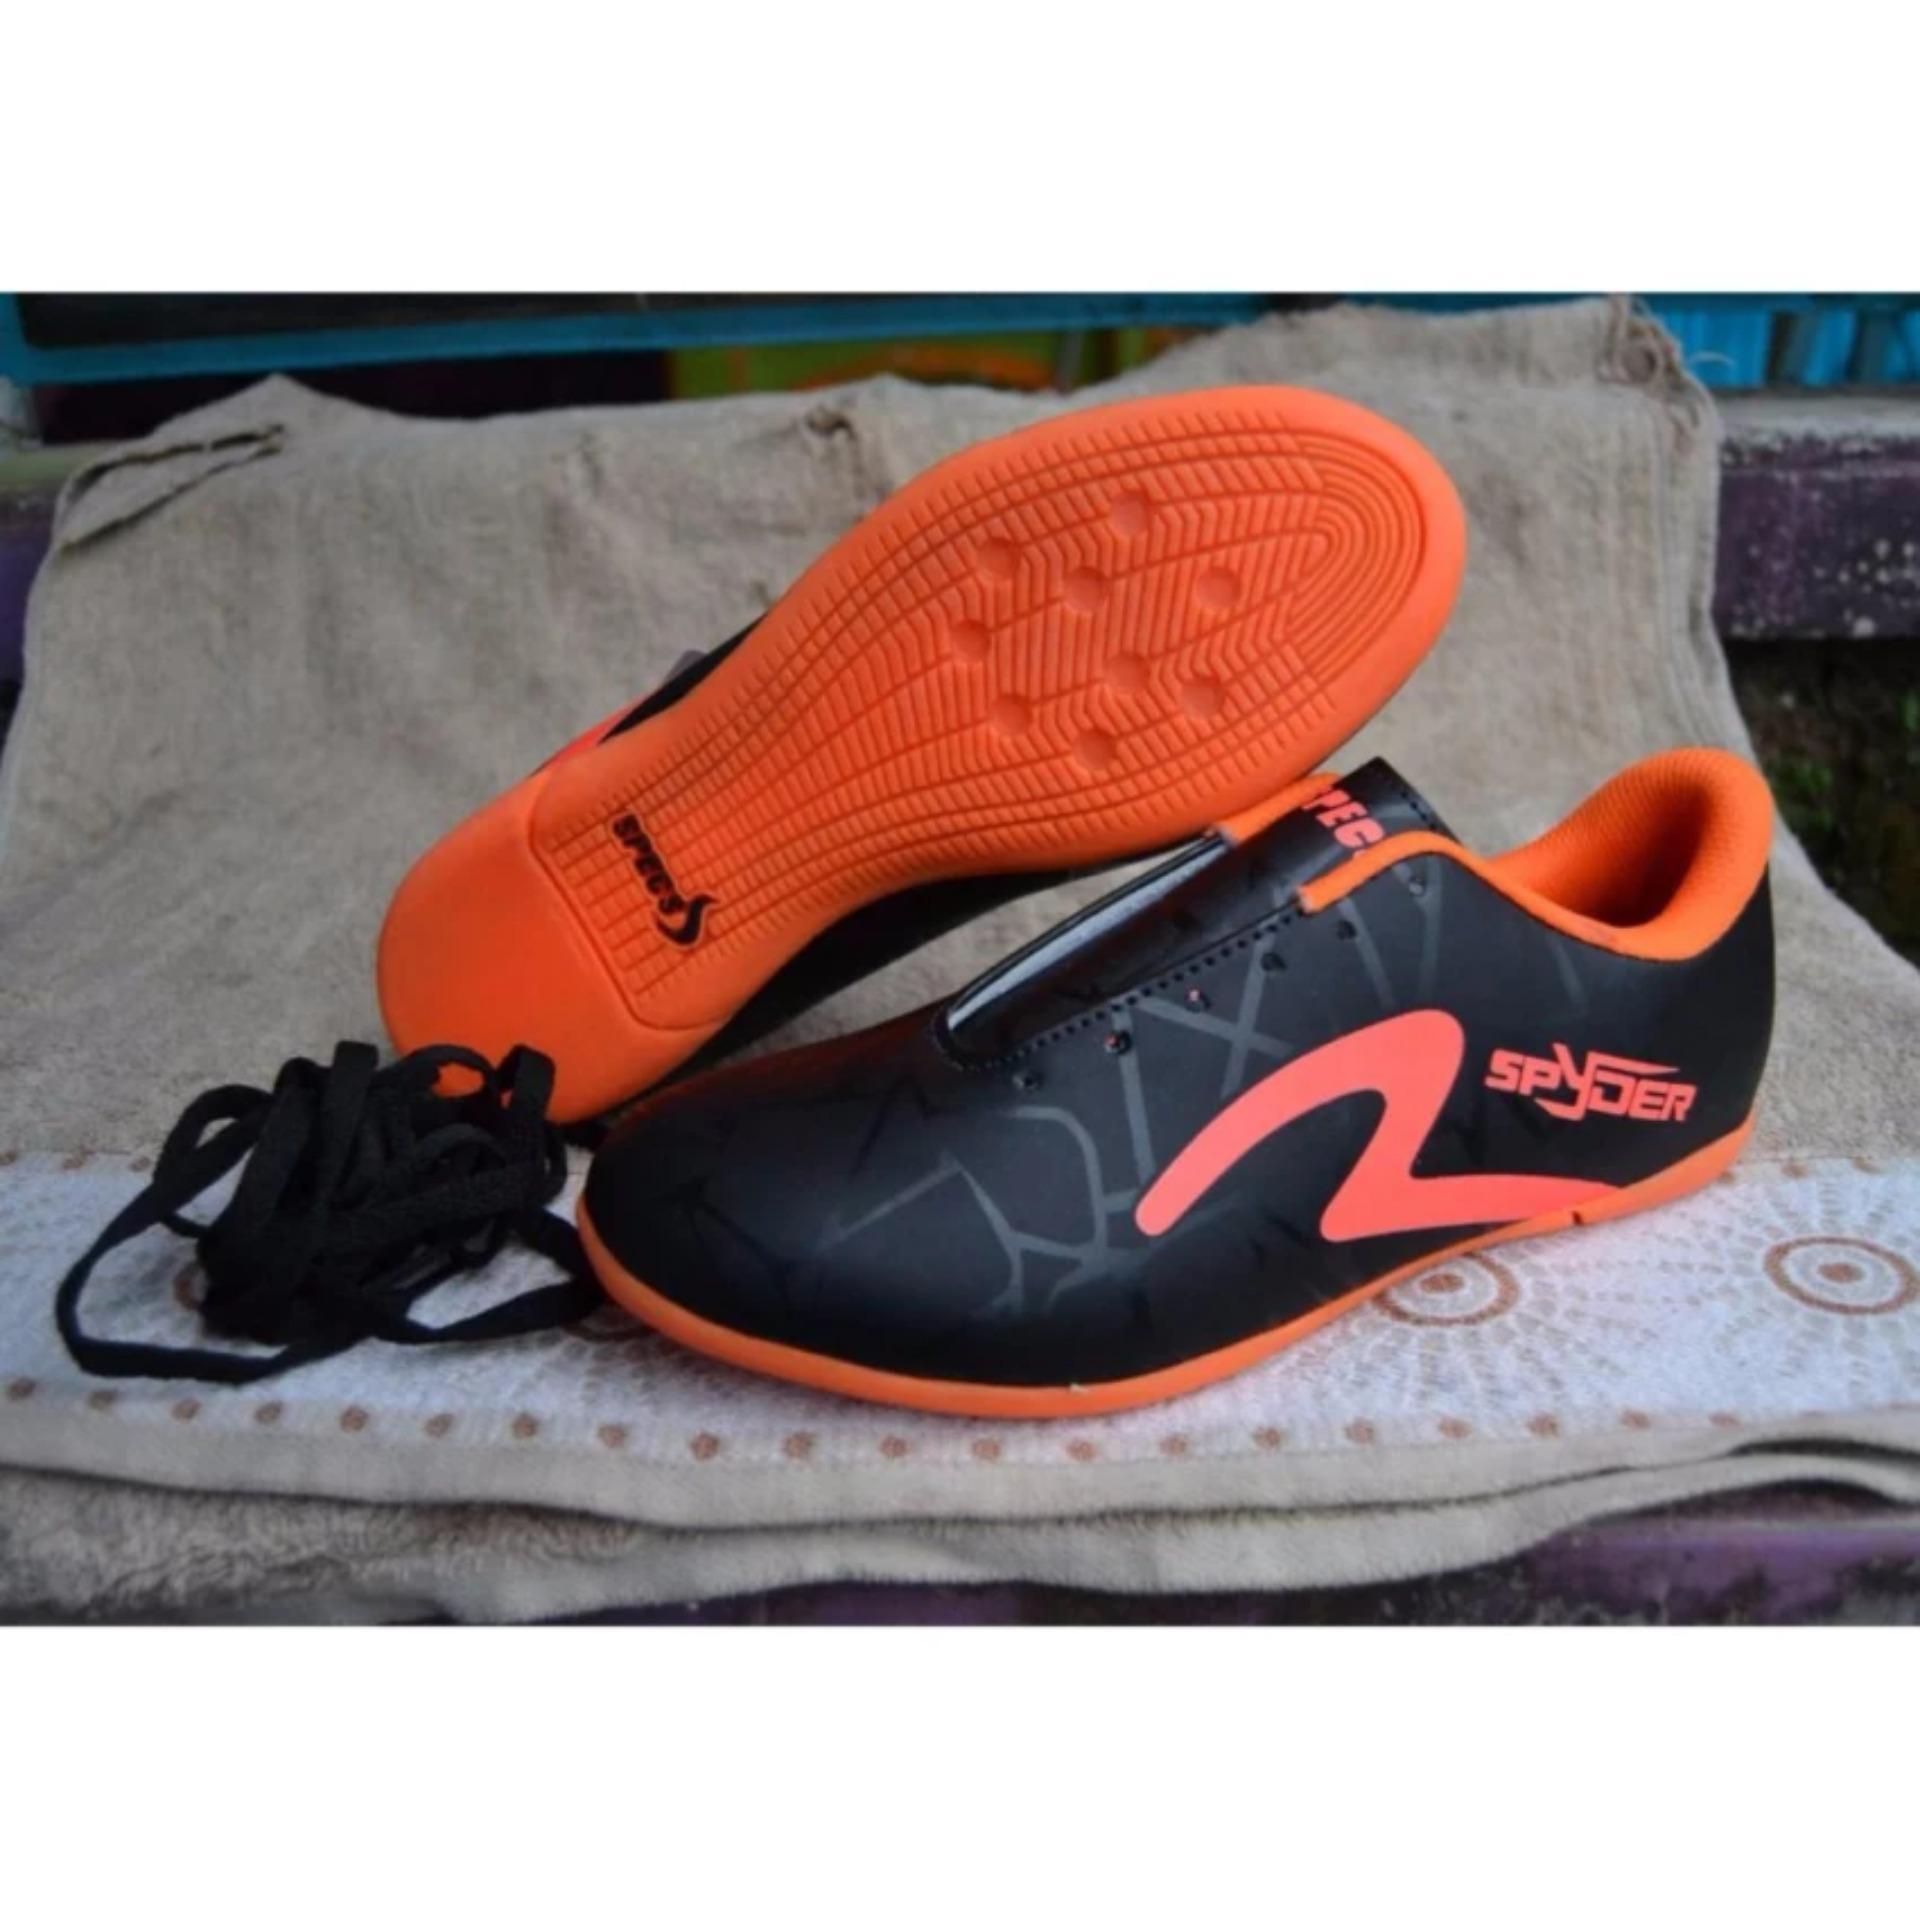 Penawaran Diskon Terbaik Sepatu Futsal Specs Bola Olahraga Pria Wanita Sport Trendy Keren